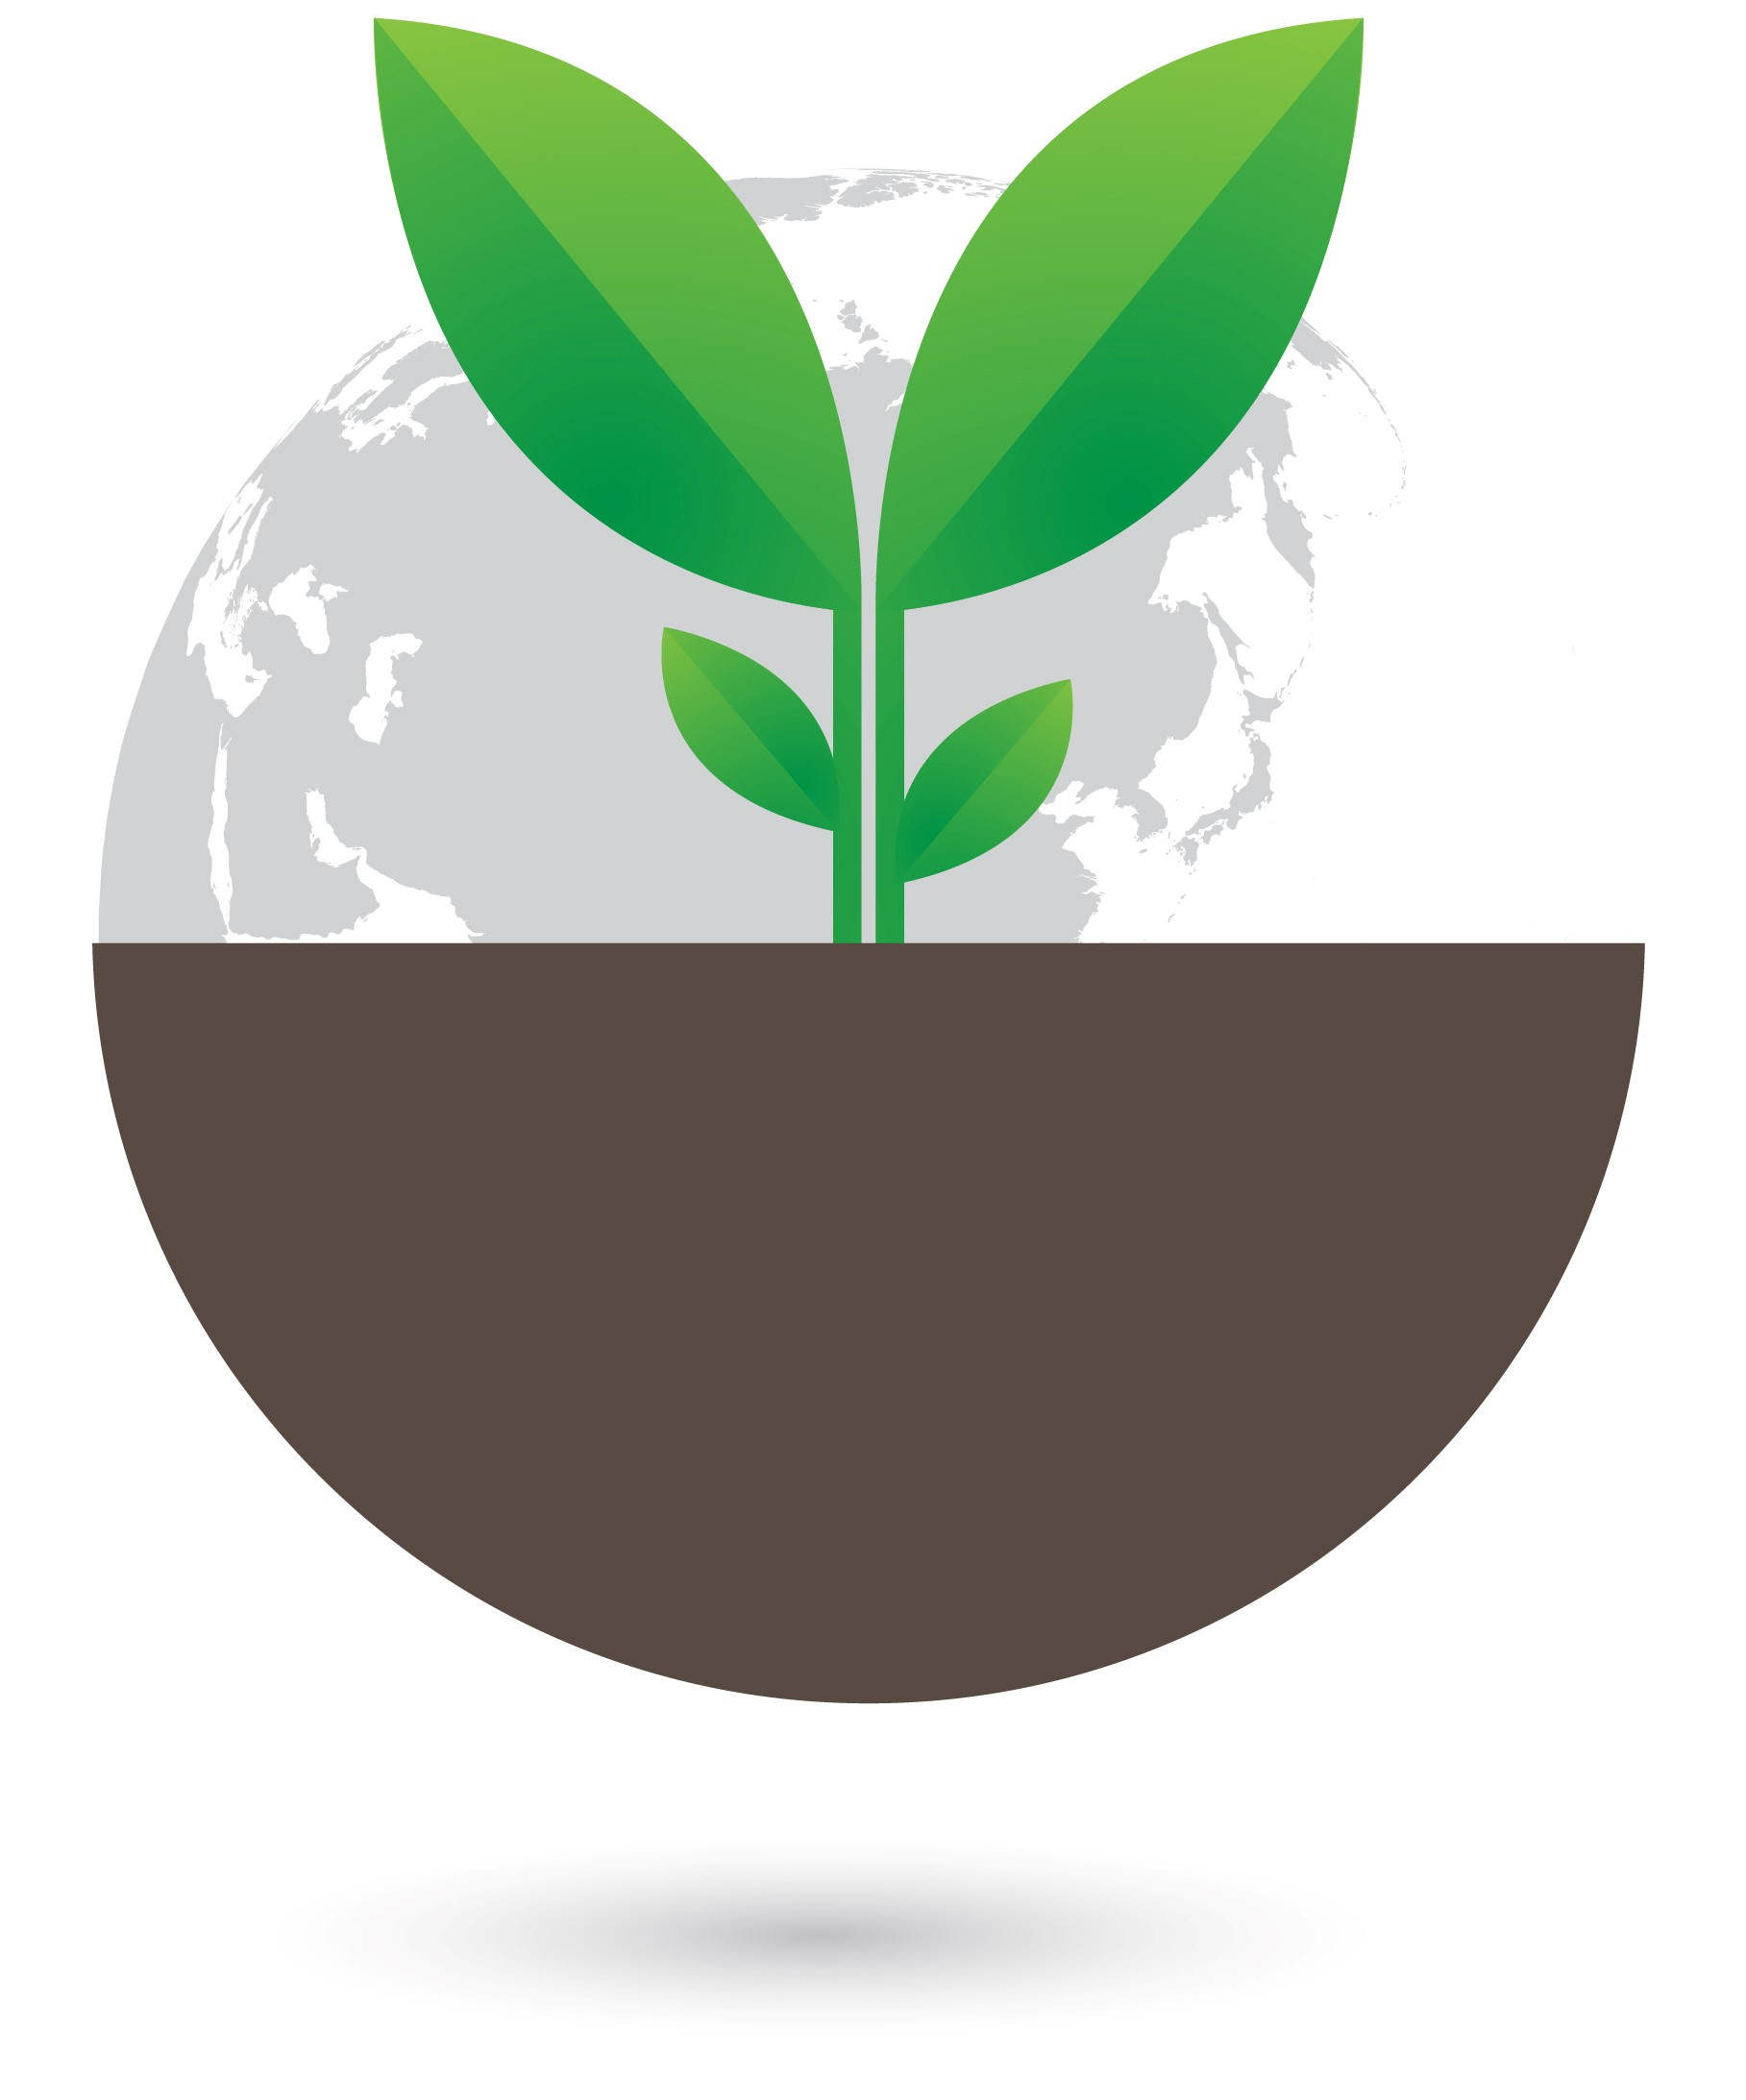 Upland Hills Health Green Initiatives: 2020